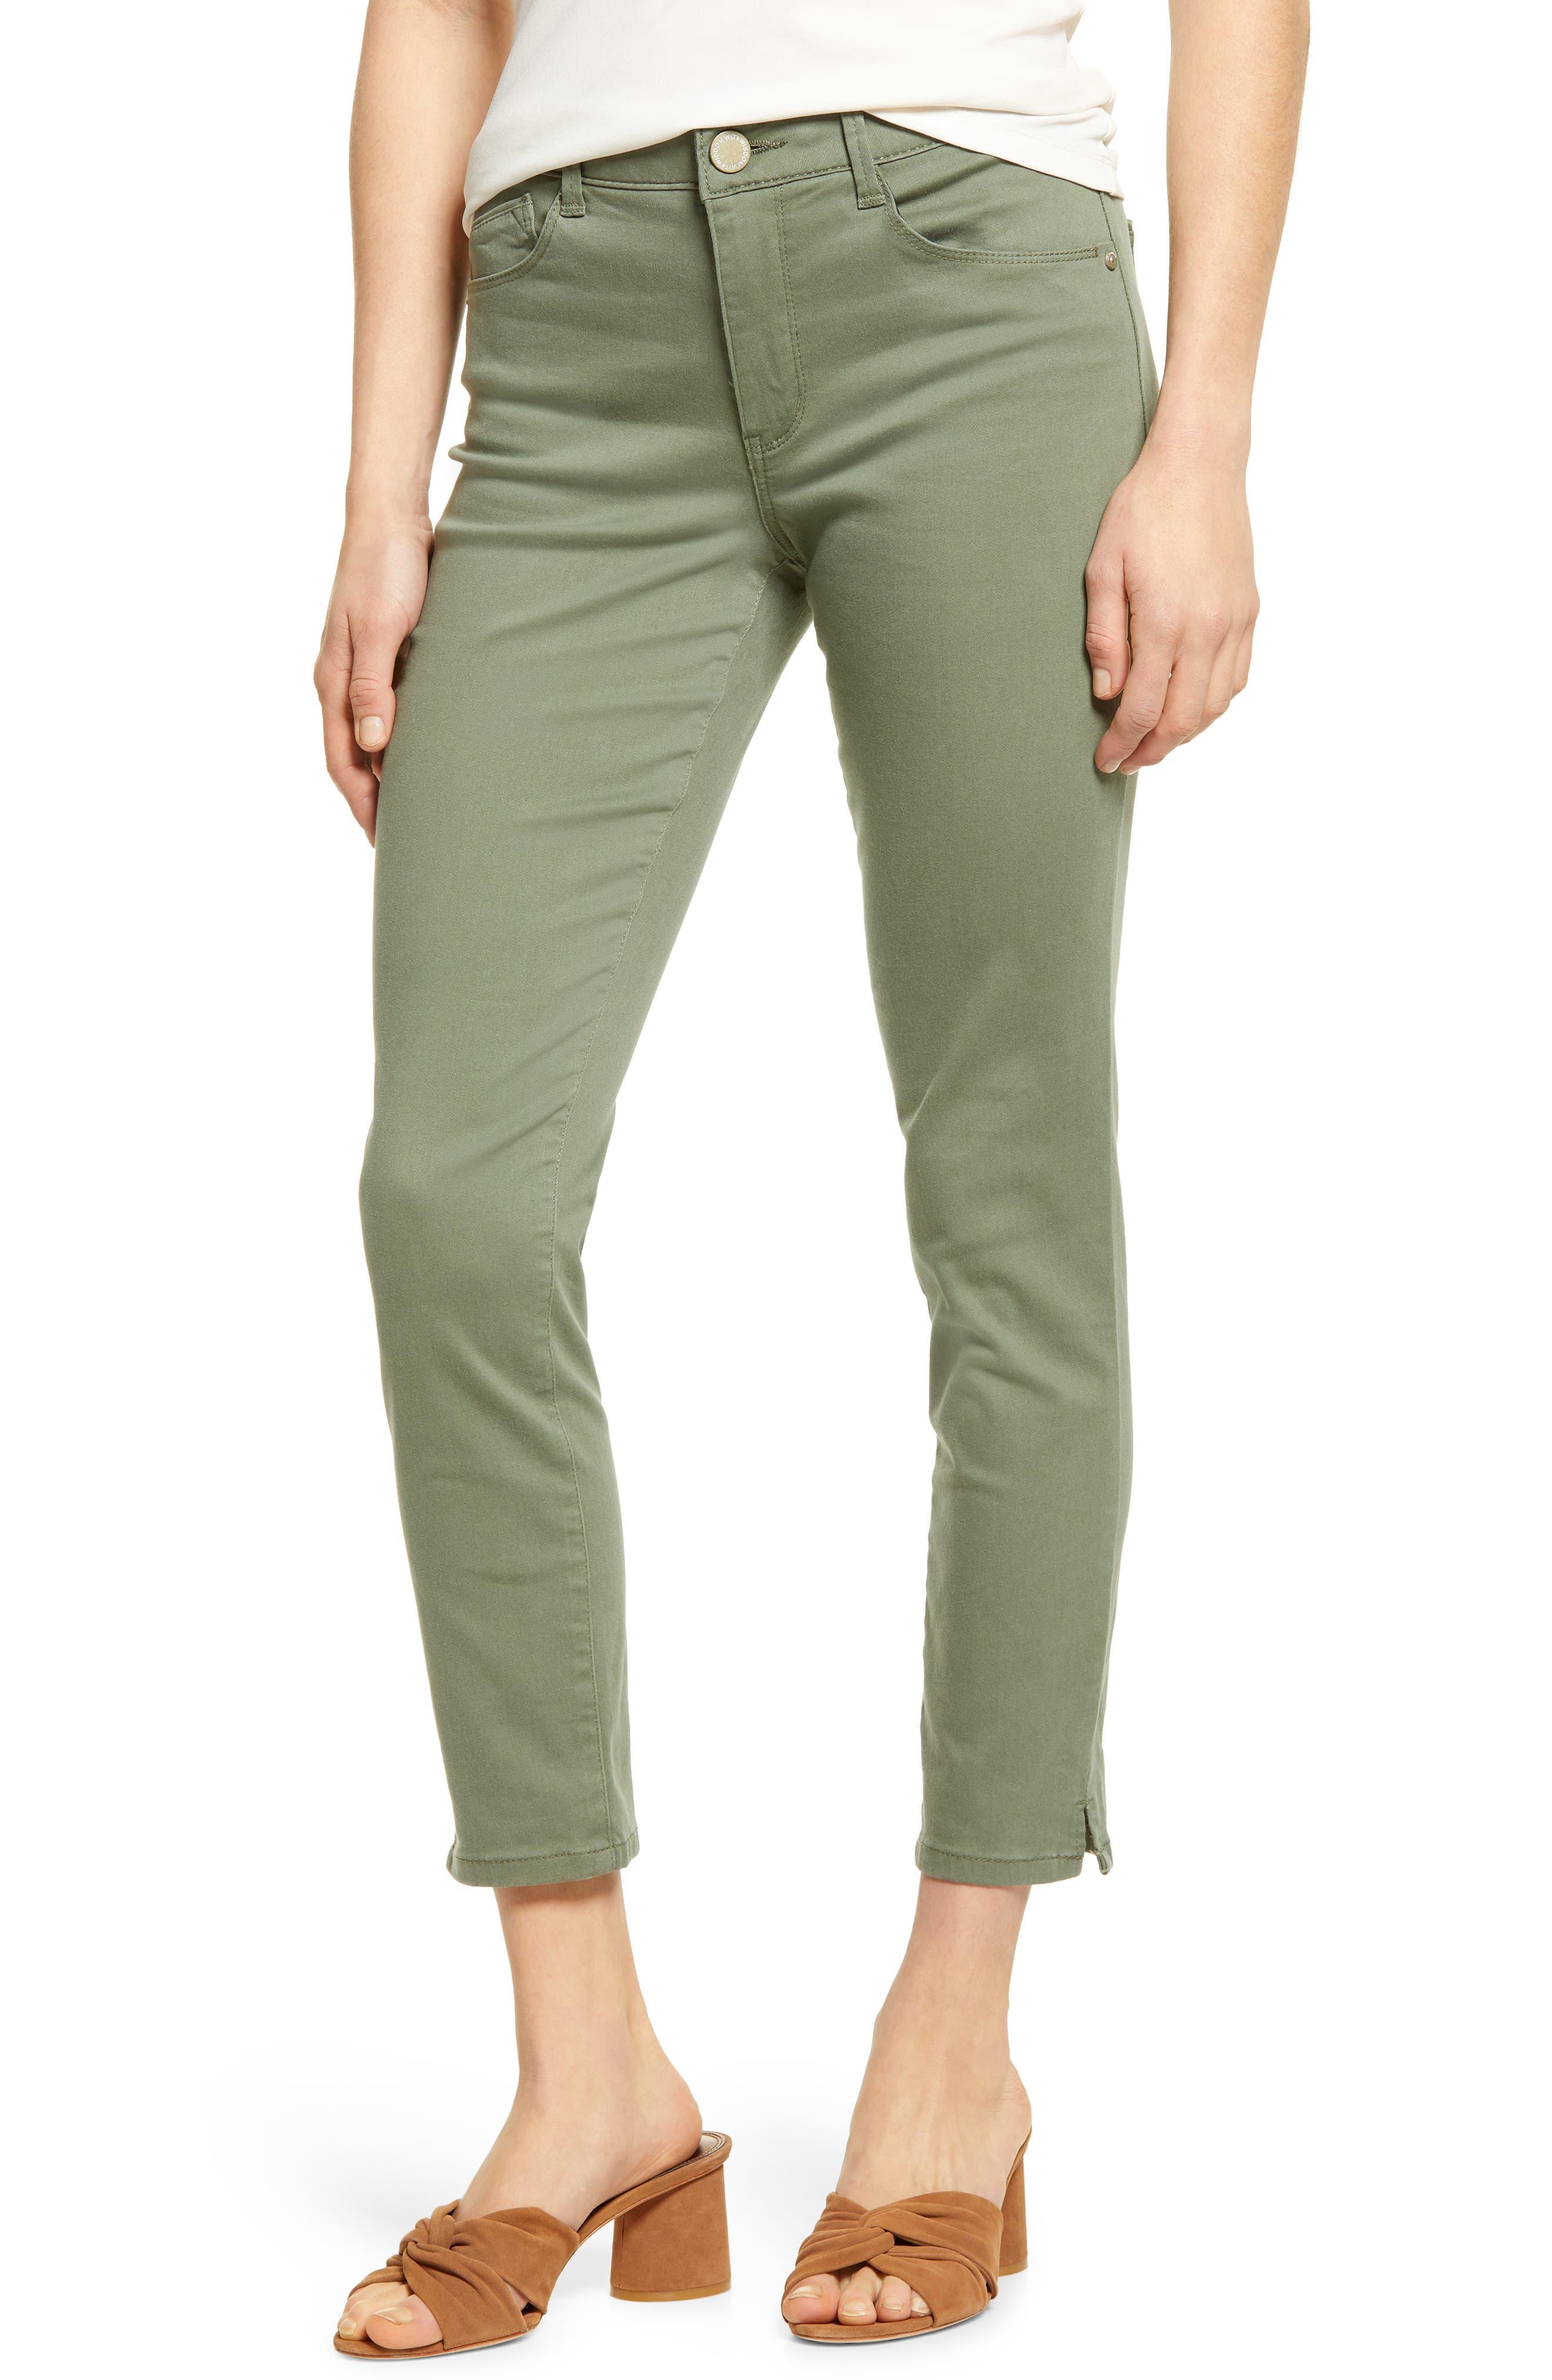 Capris 4 6 8 10 New Ladies Fitted Waist Blue Stripe 3//4 Trouser